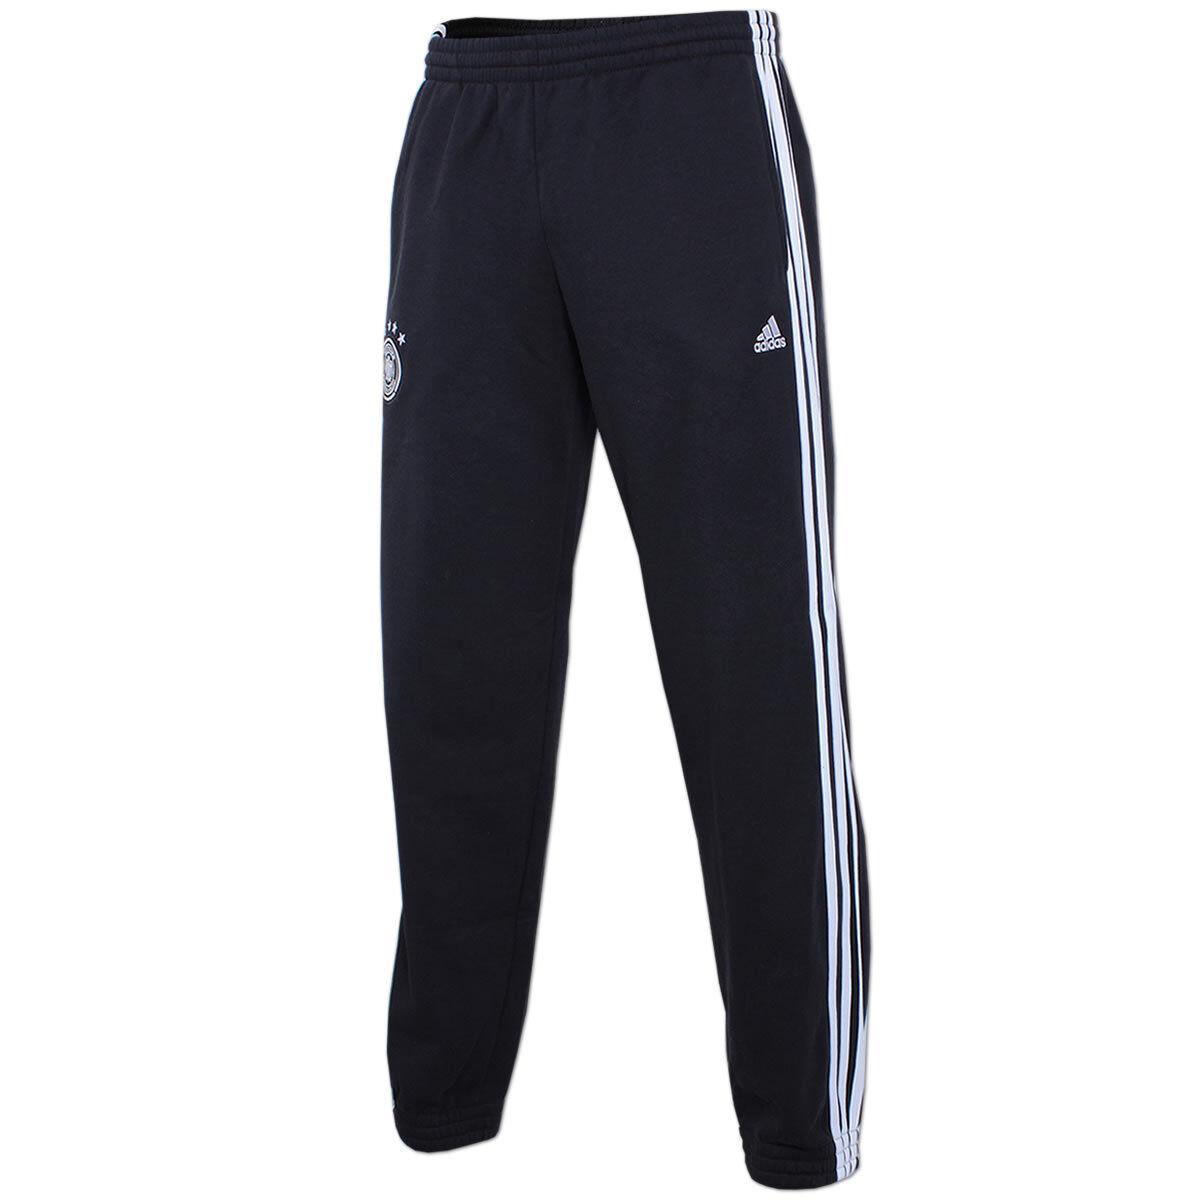 Adidas Herren DFB Pant Trainingshose Fußballhose Sweat Pant Sporthose 4 Sterne    | Zuverlässige Leistung